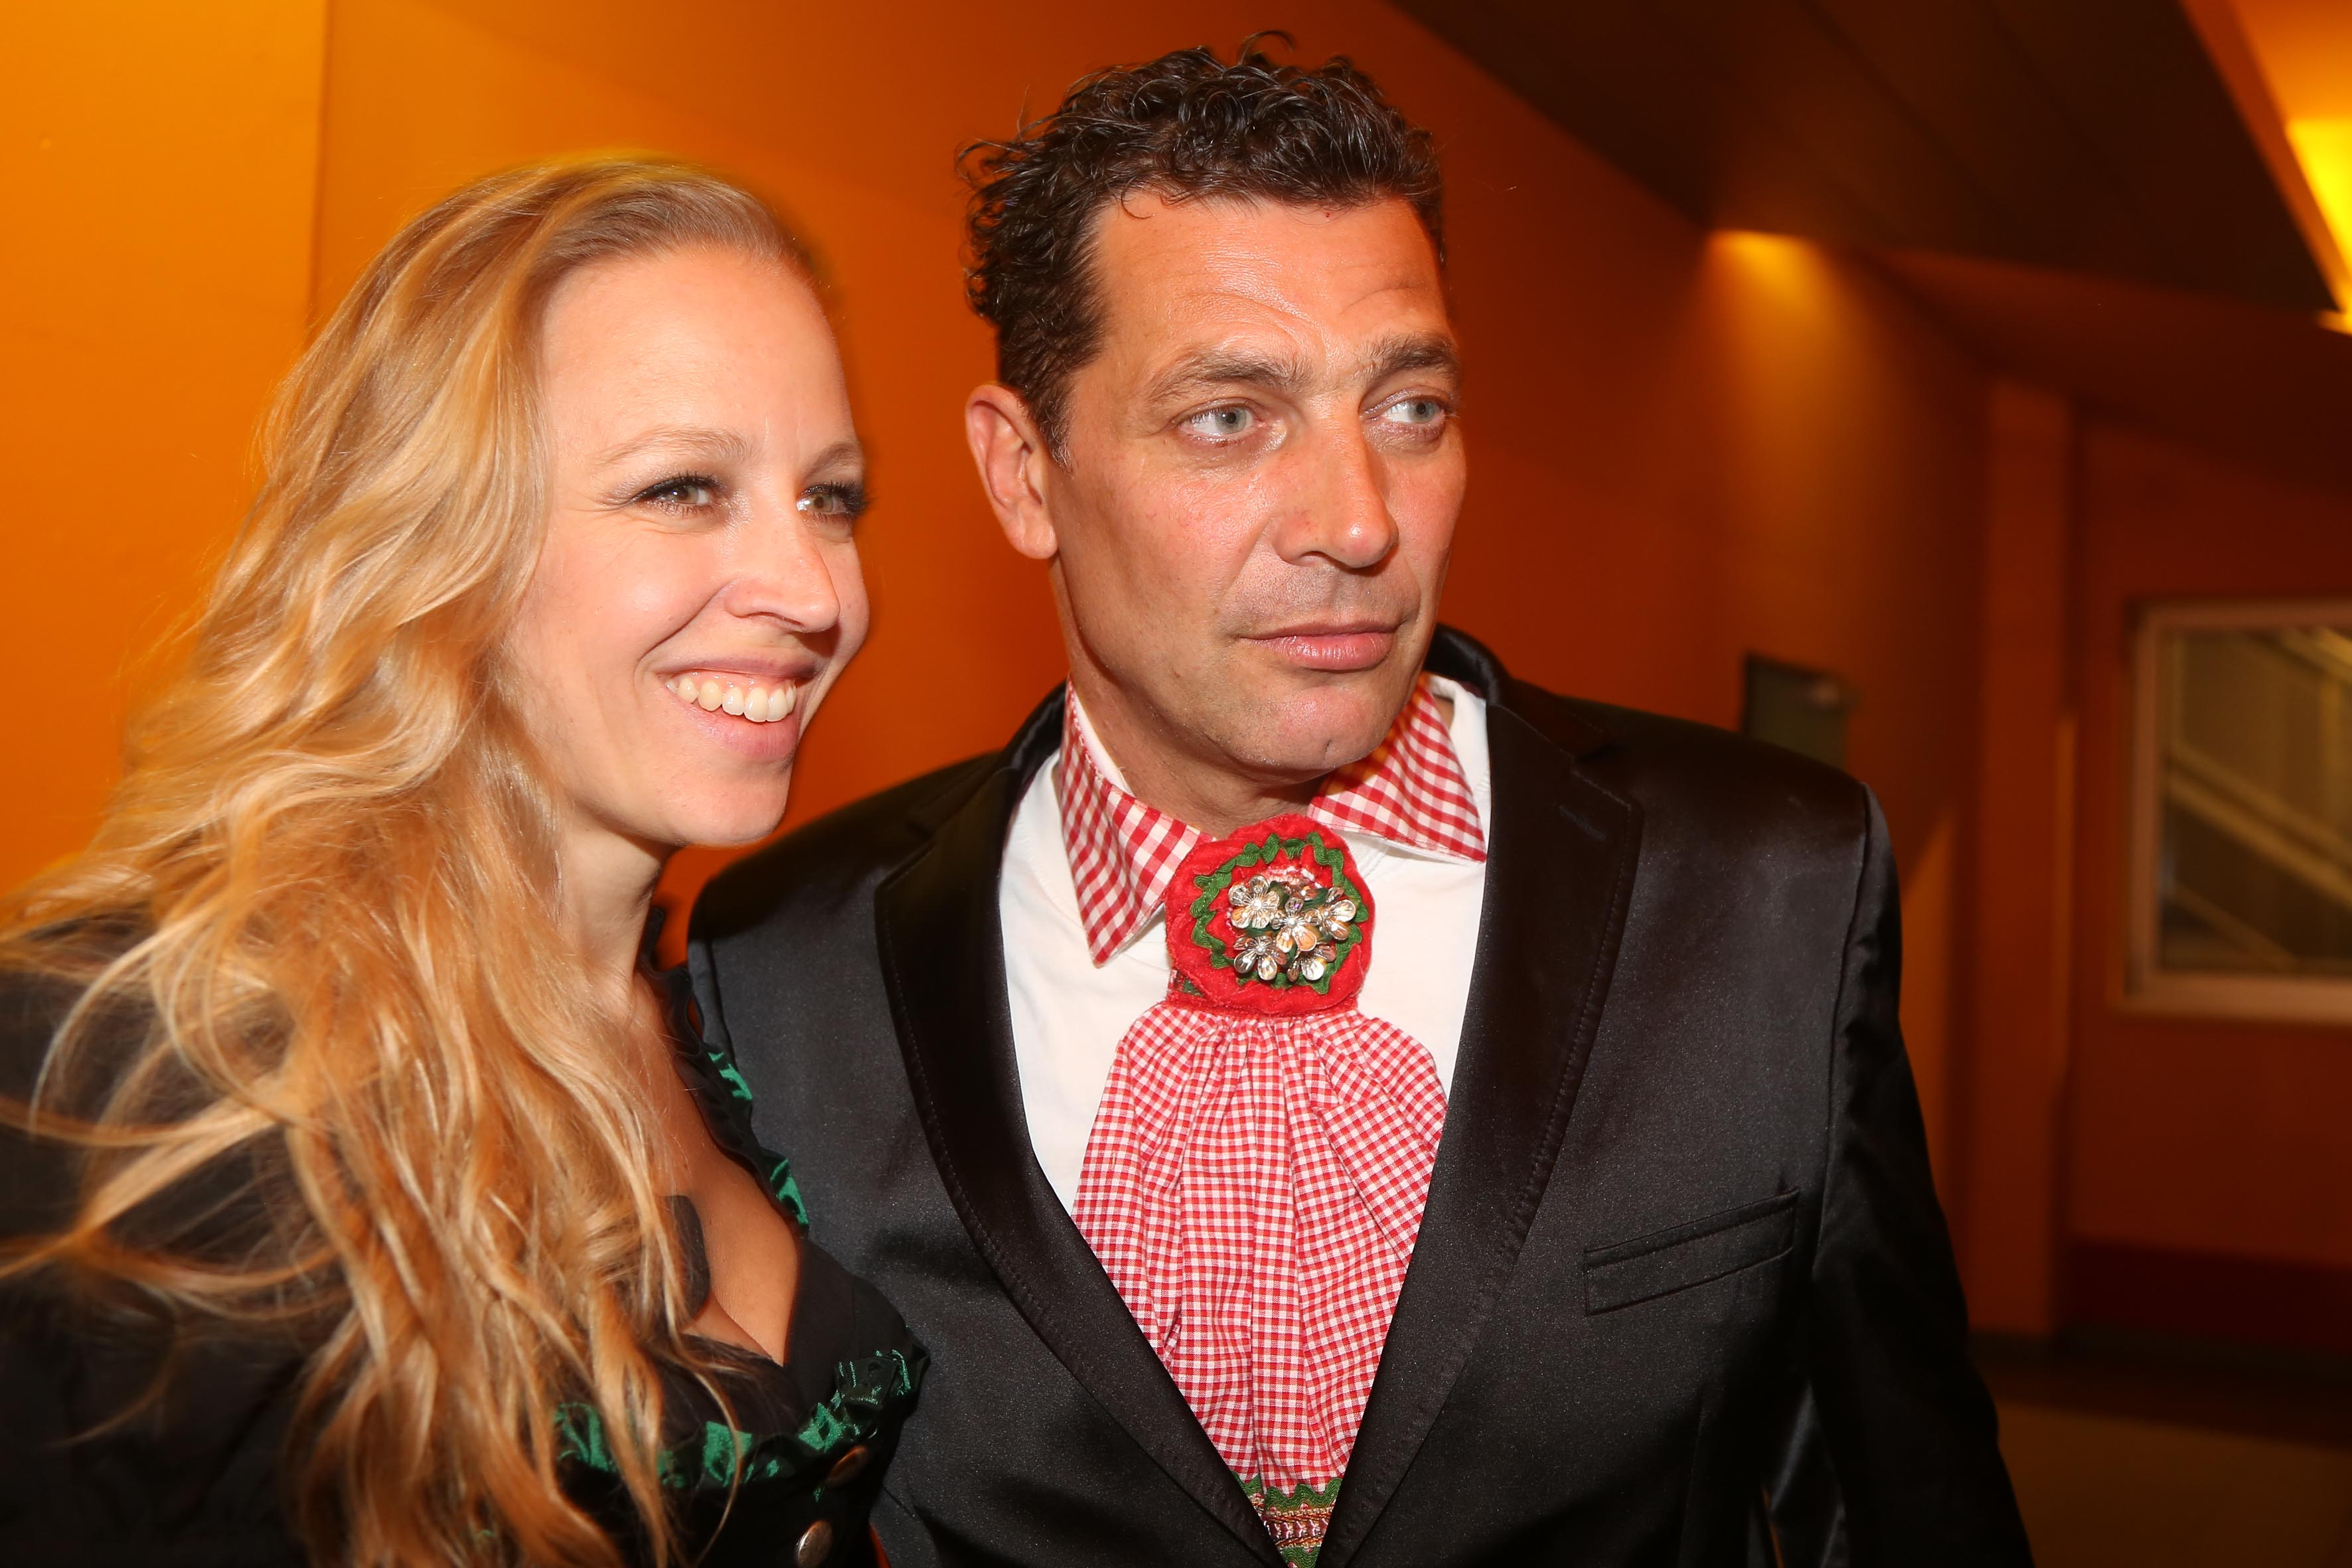 Nina Proll mit ihrem Lebensgefährten Gregor Bloeb